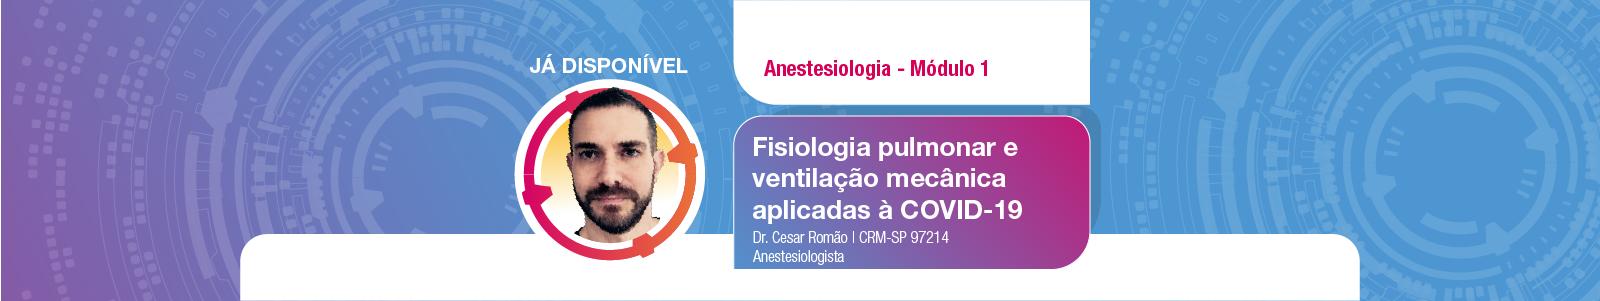 Módulo 1 Anestesiologia disponível